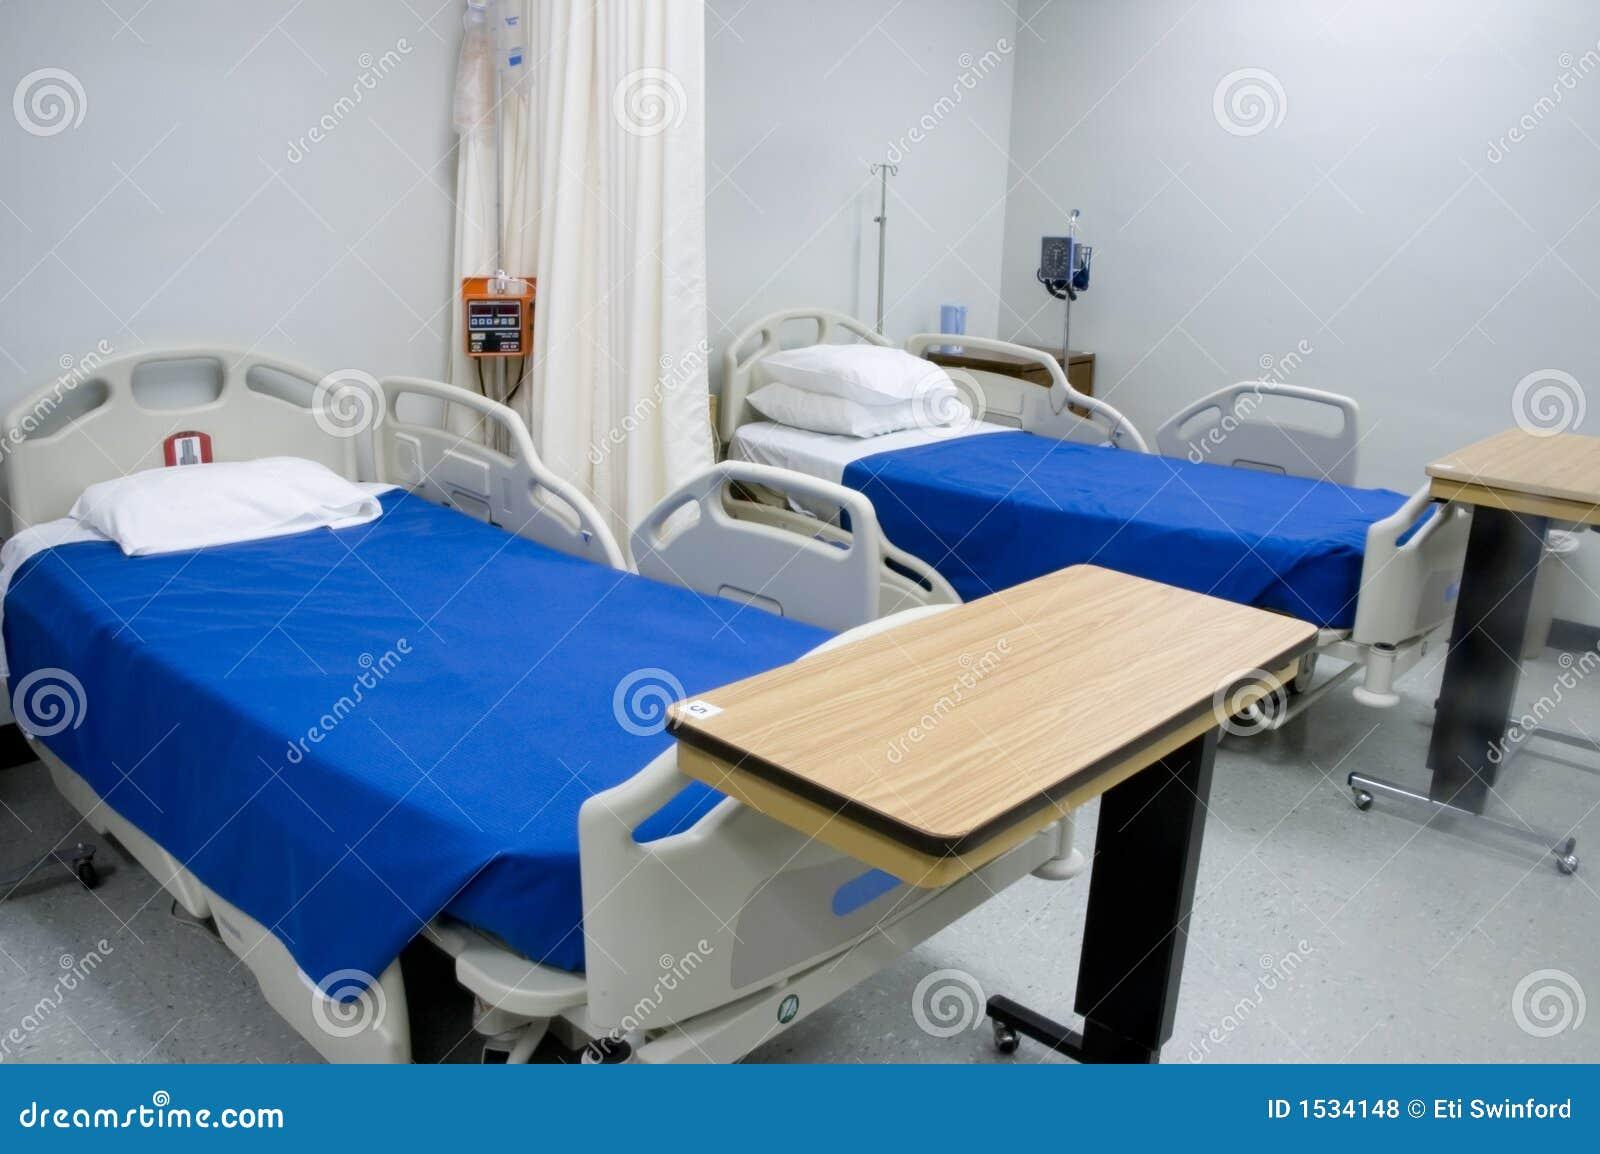 Hospital beds 3 royalty free stock photos image 1534148 for Cama cerrada